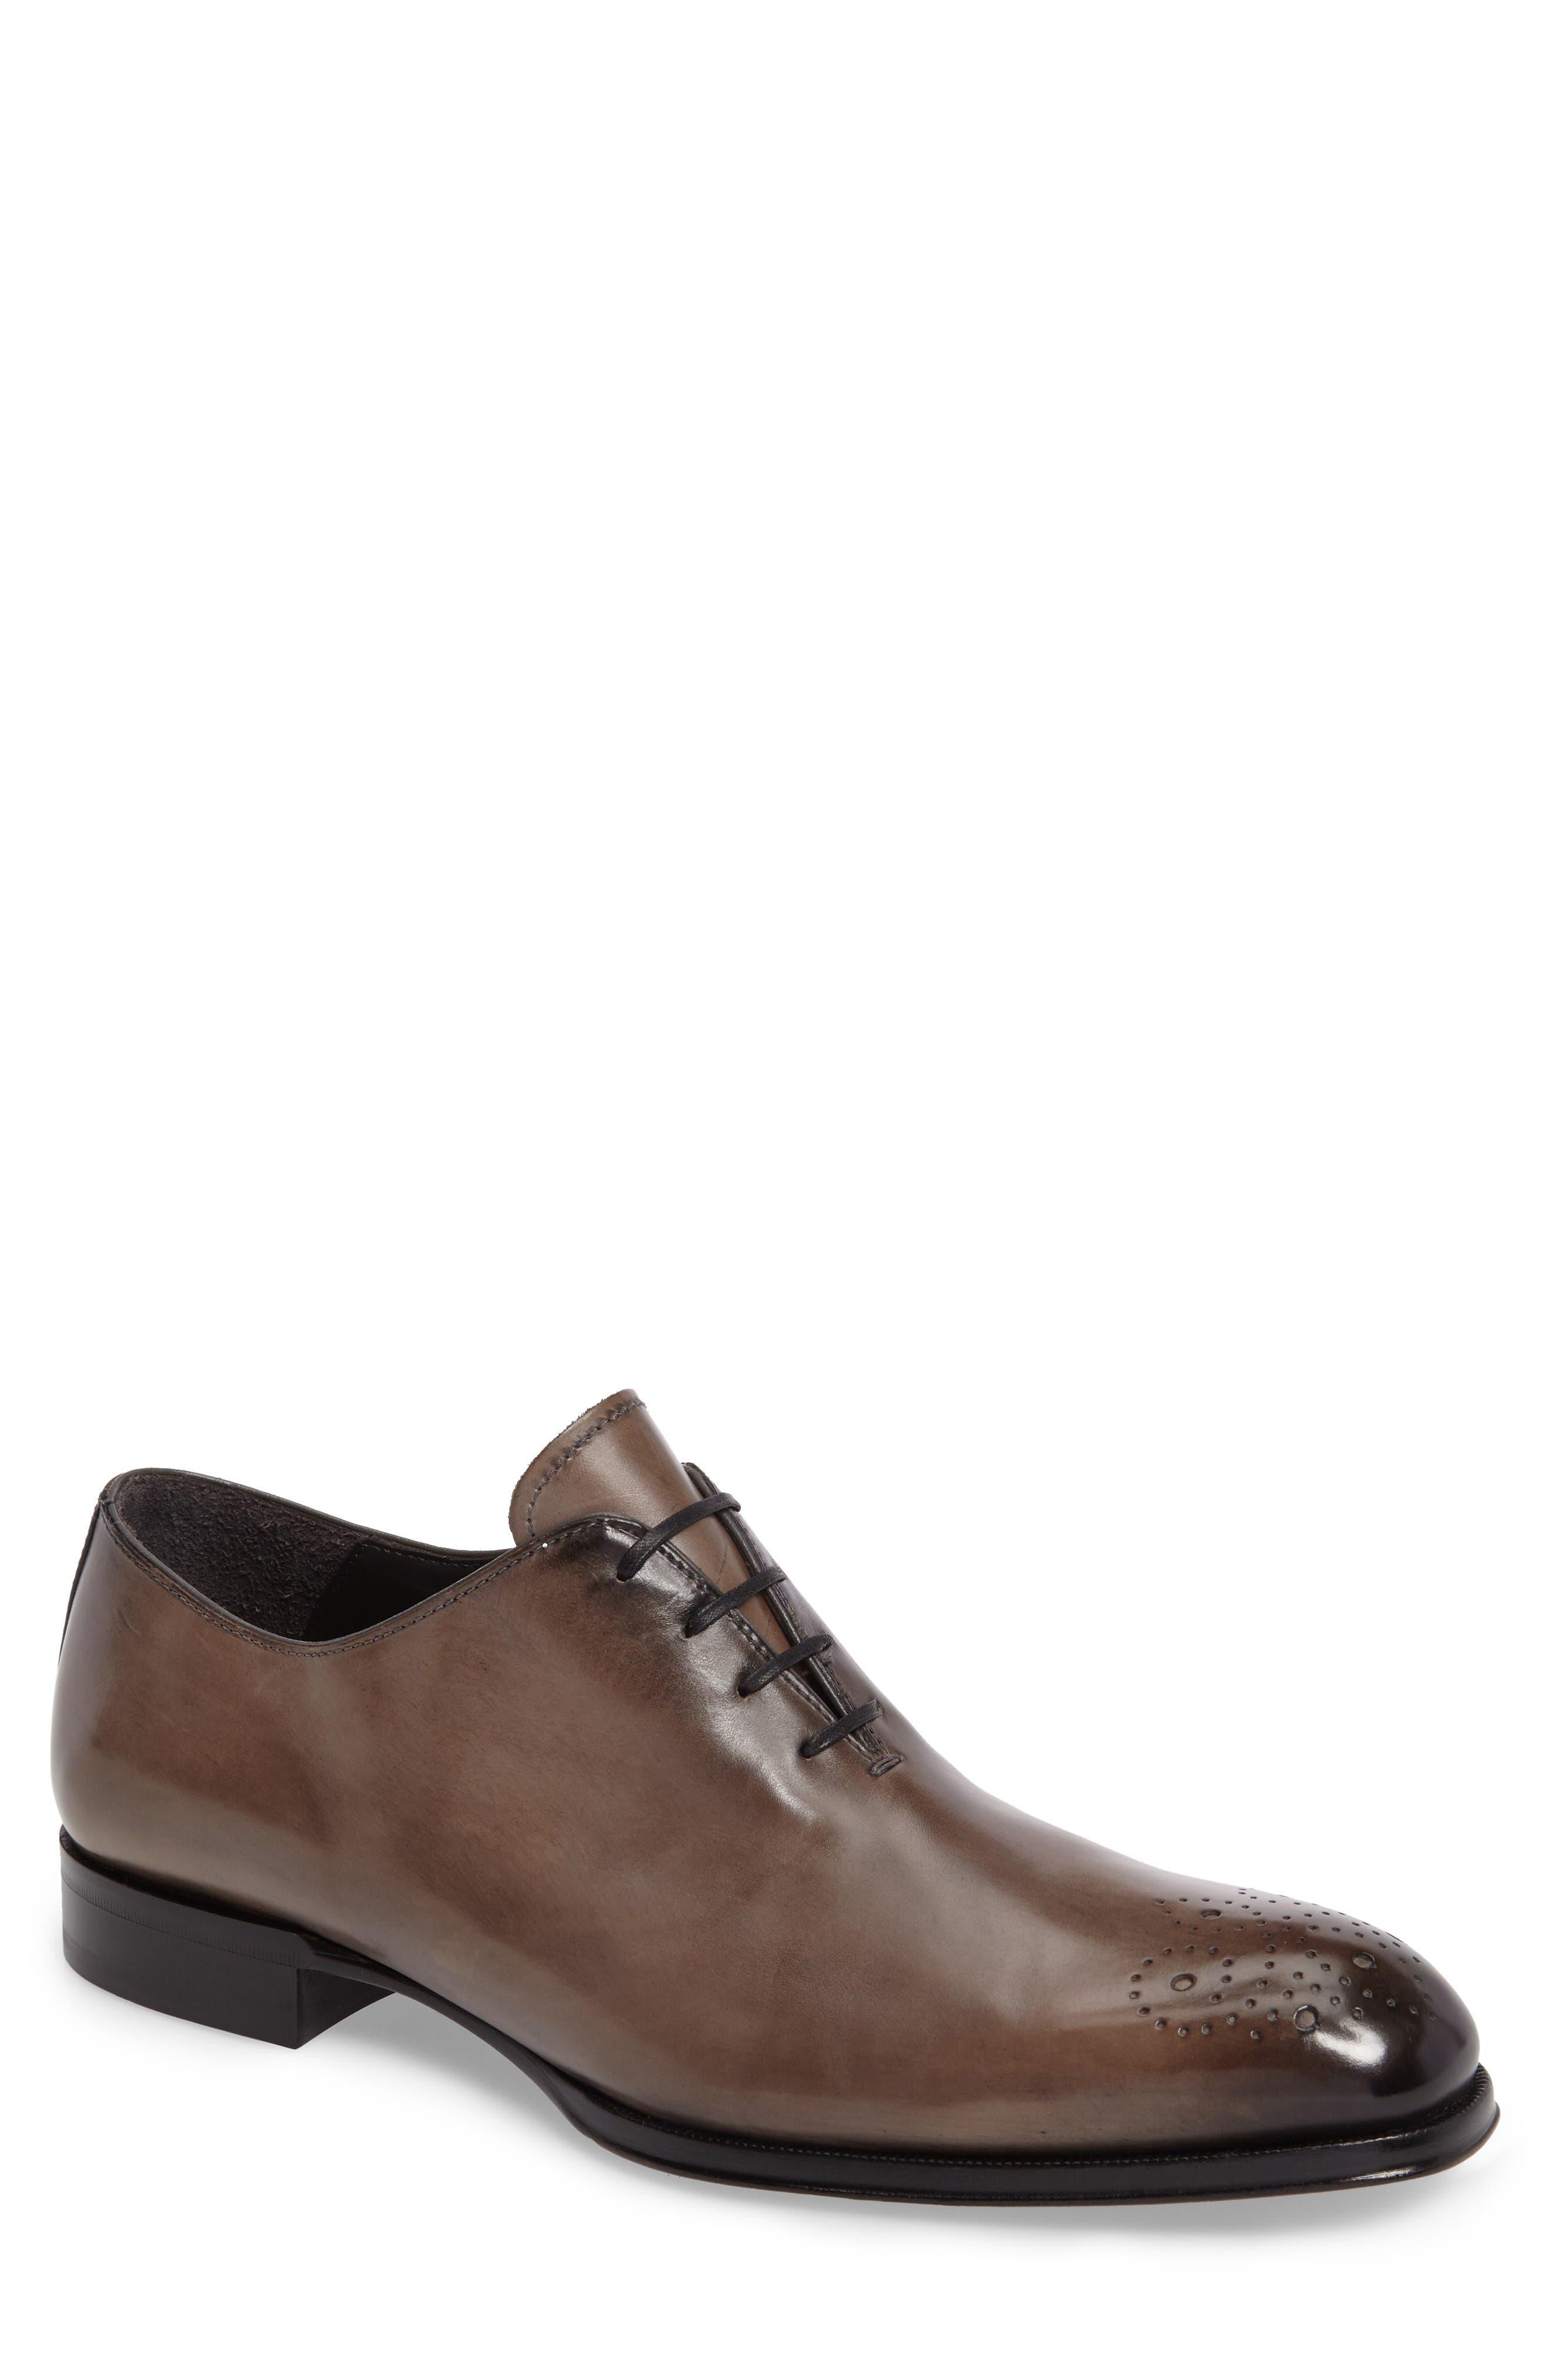 Bateman Brogue Oxford,                         Main,                         color, Grey Leather